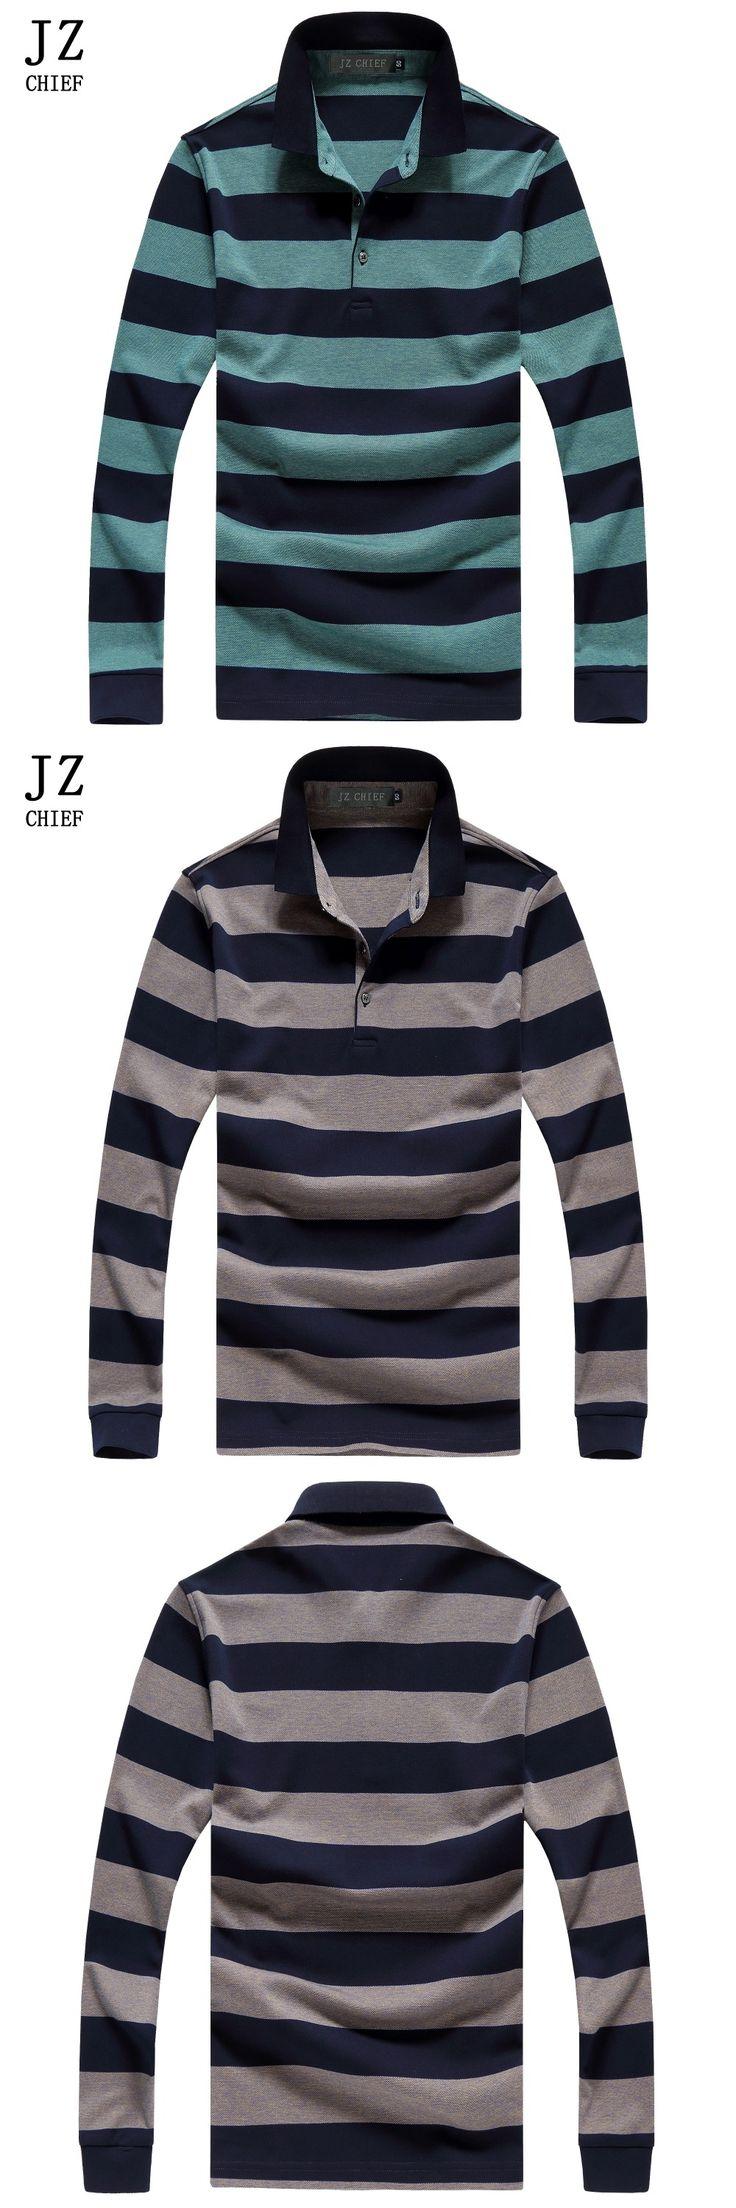 JZ CHIEF Polo Shirt Men Blouse Men Shirt Long Sleeve Striped Polo Green Brown Shirt Polos Baseball Jersey Men Cotton Shirt